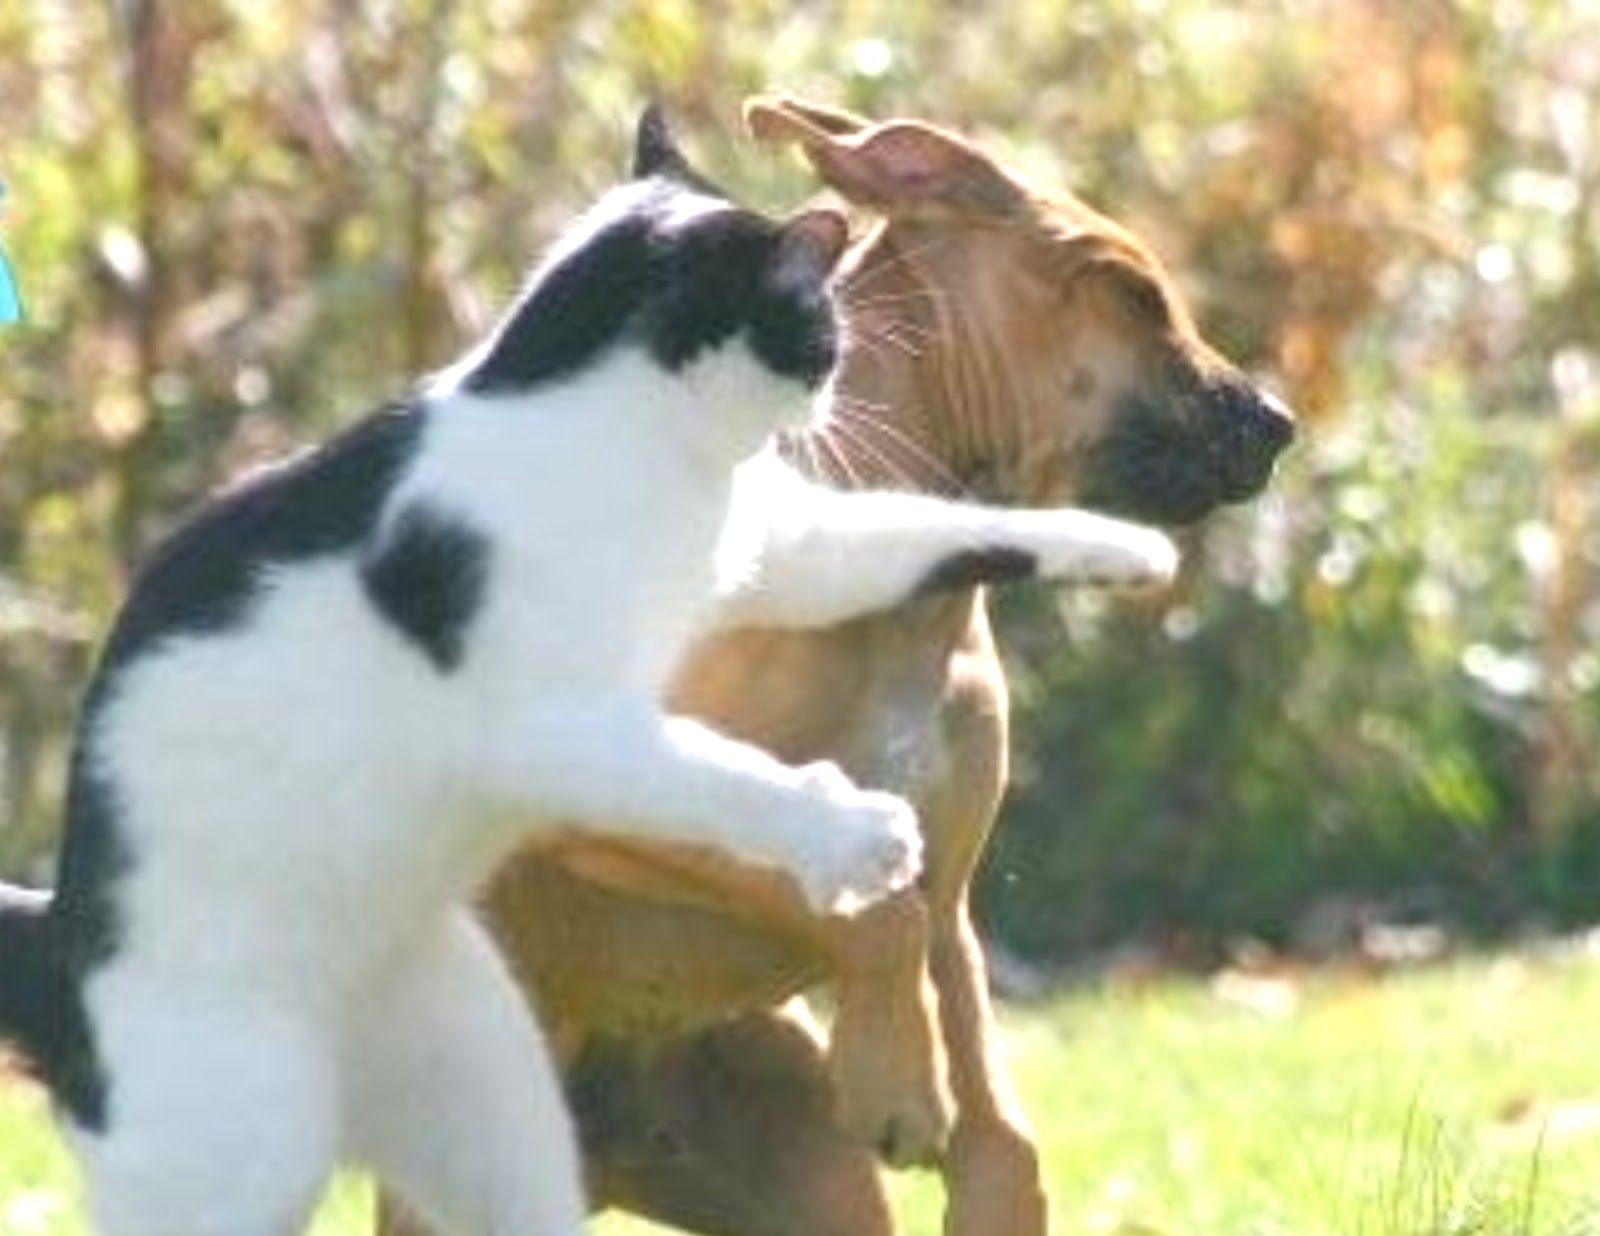 Kucing Pukul Anjing Seger Pinterest